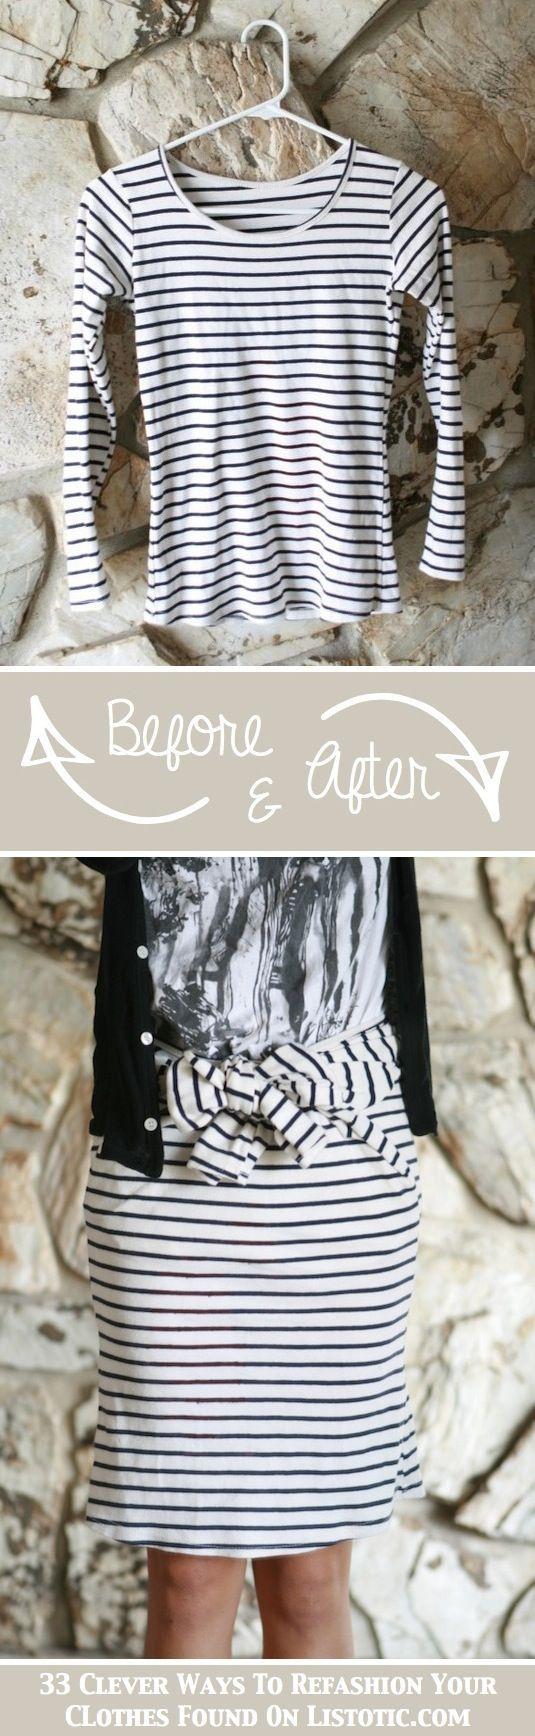 ¡Crea ropa nueva con tu ropa vieja!